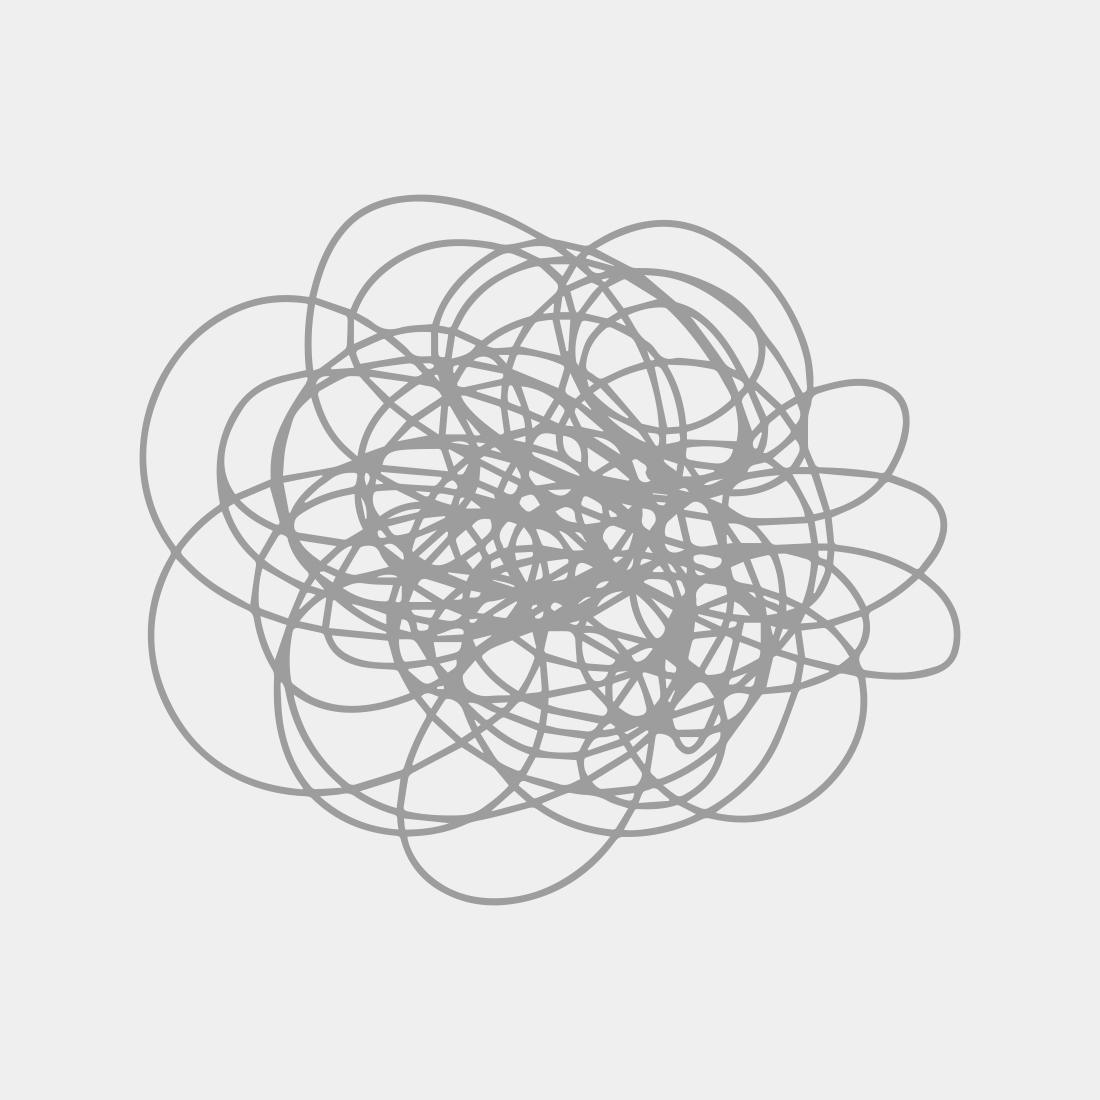 Albert Irvin OBE RA Untitled opus w.30